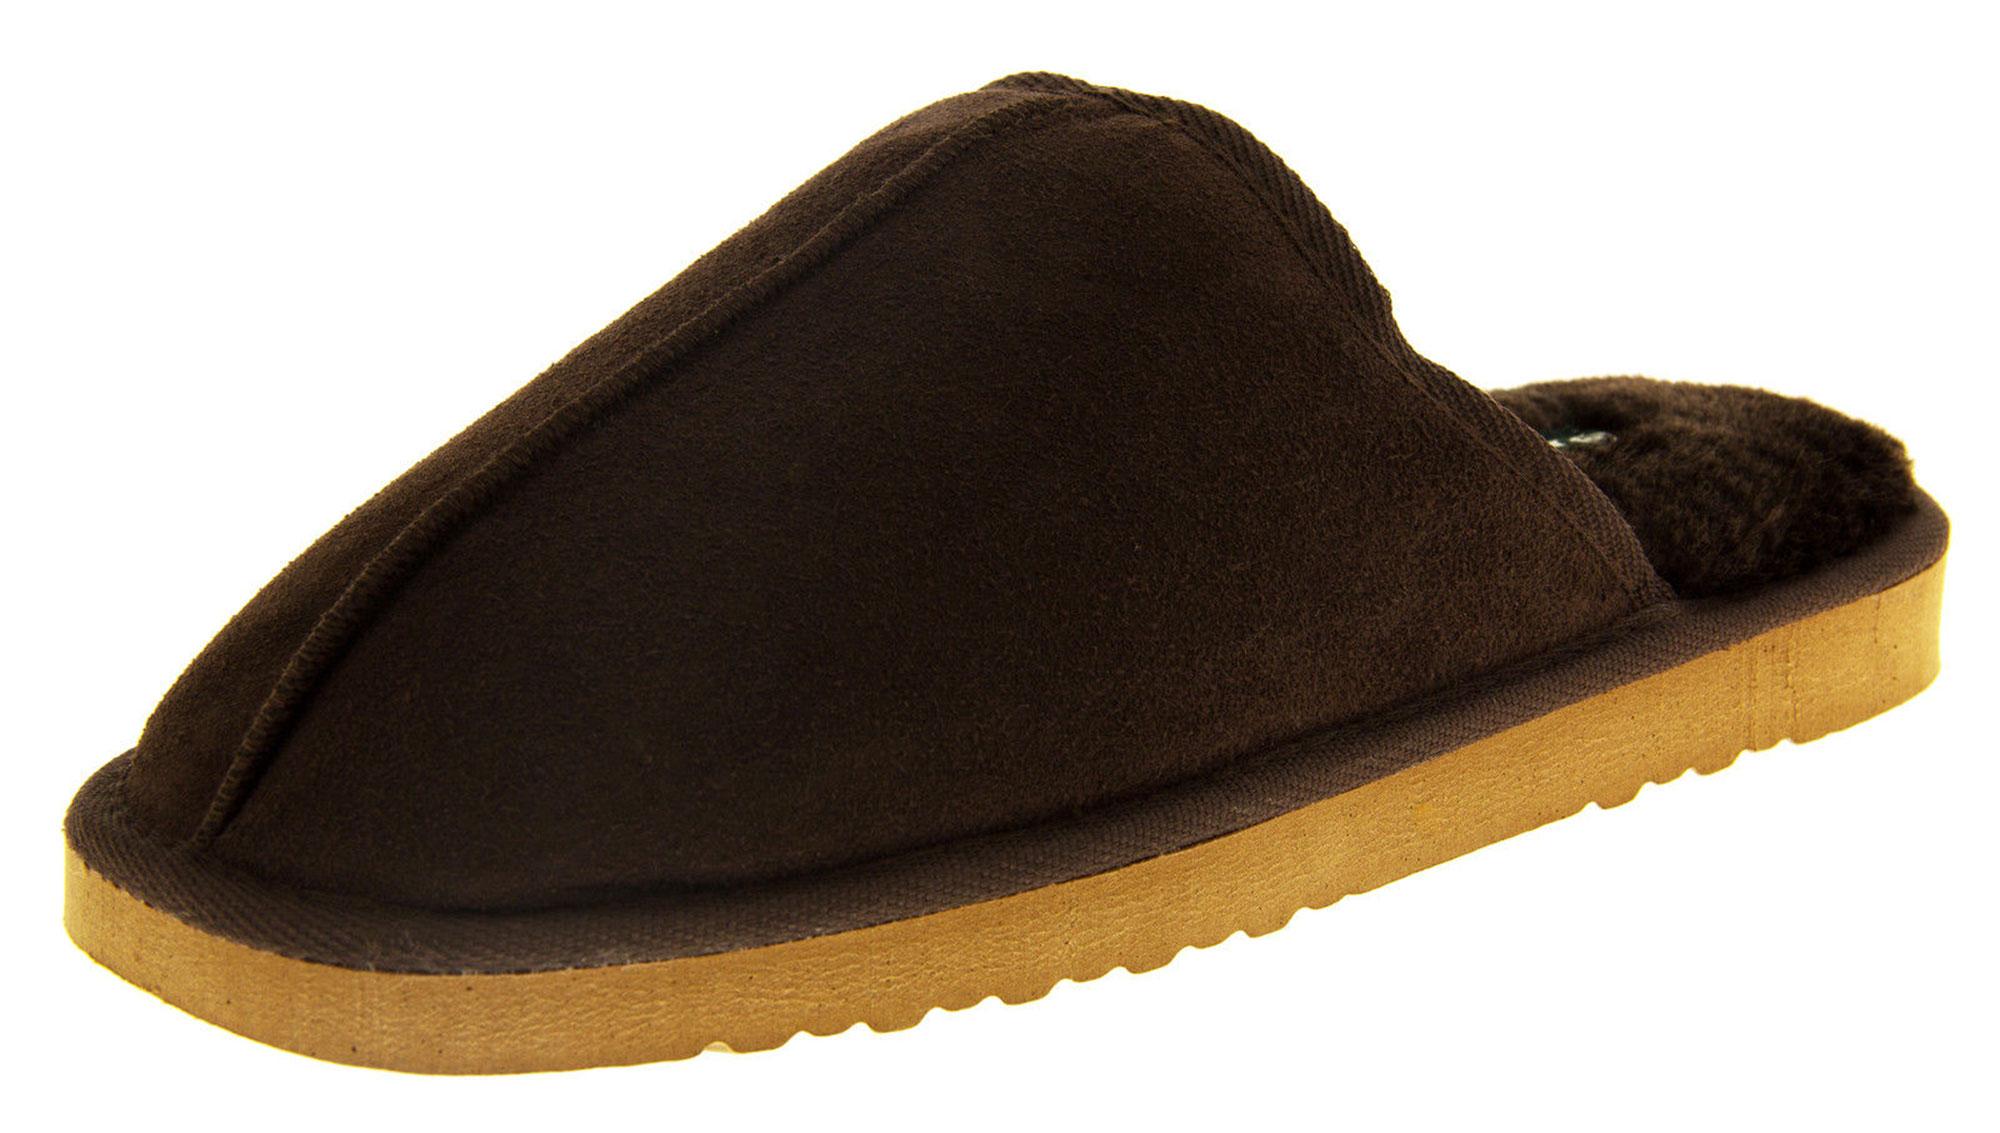 Chocolate Brown Suede Shoe Dye